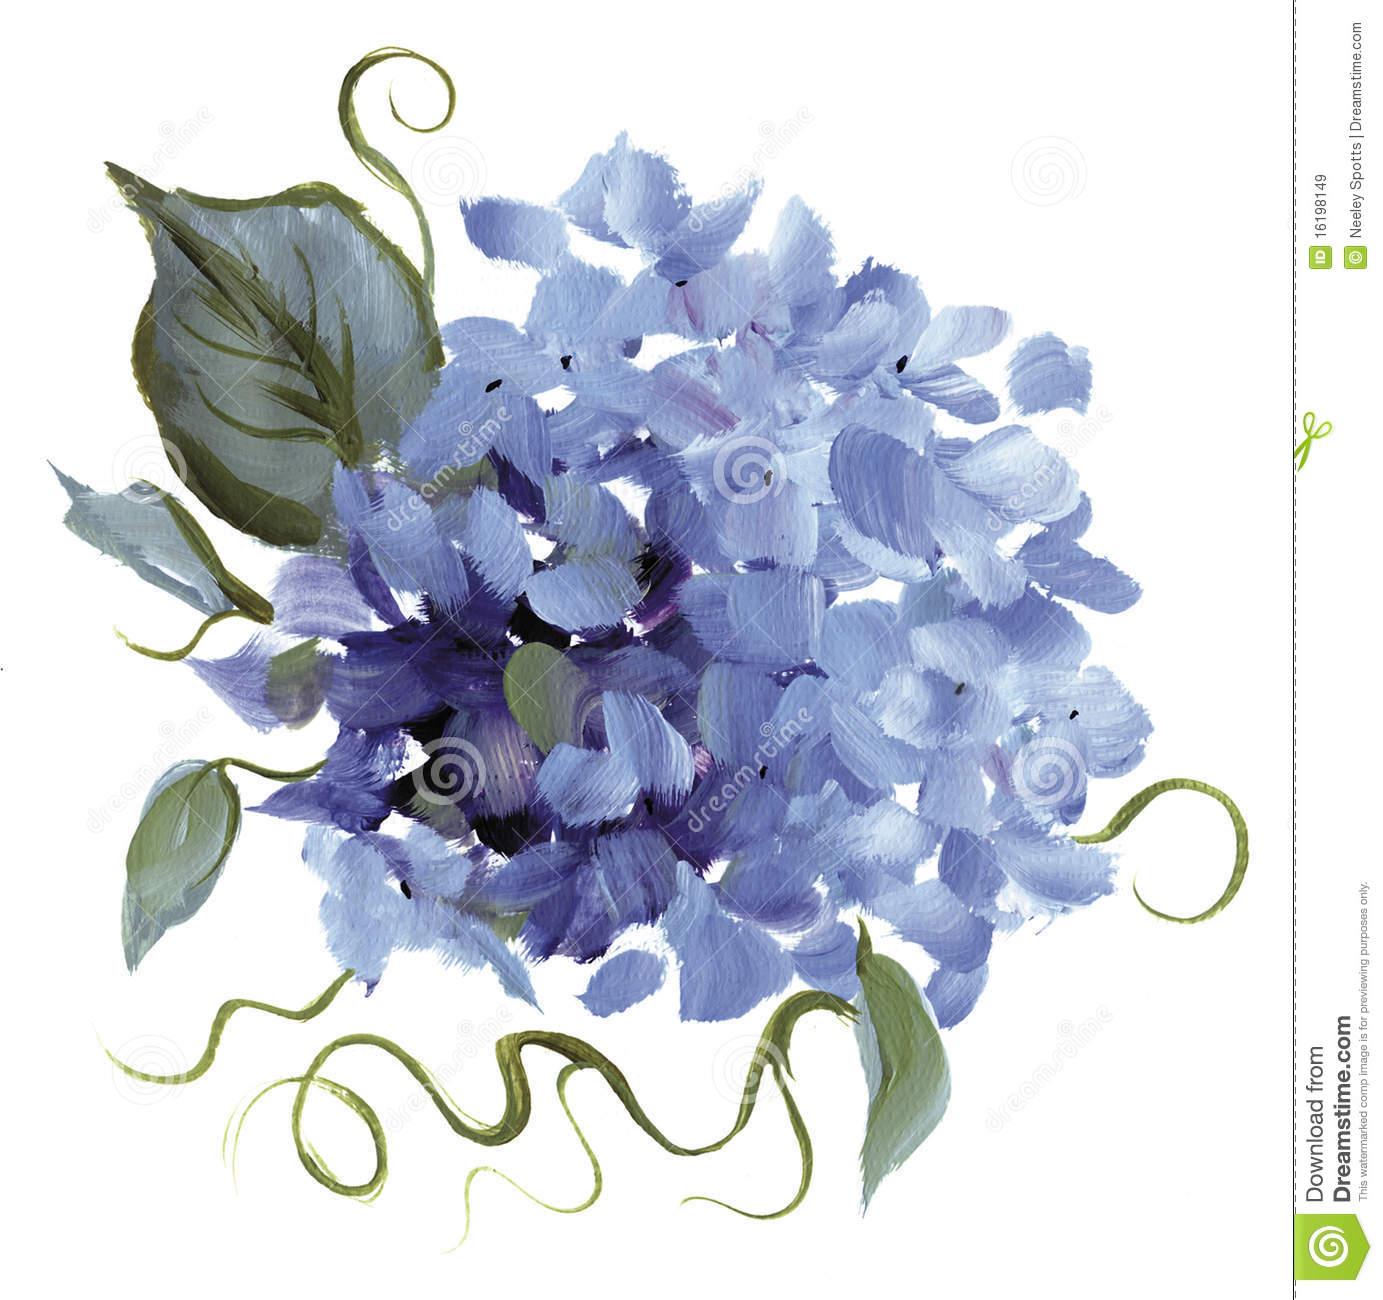 Free clipart hydrangea flowers.